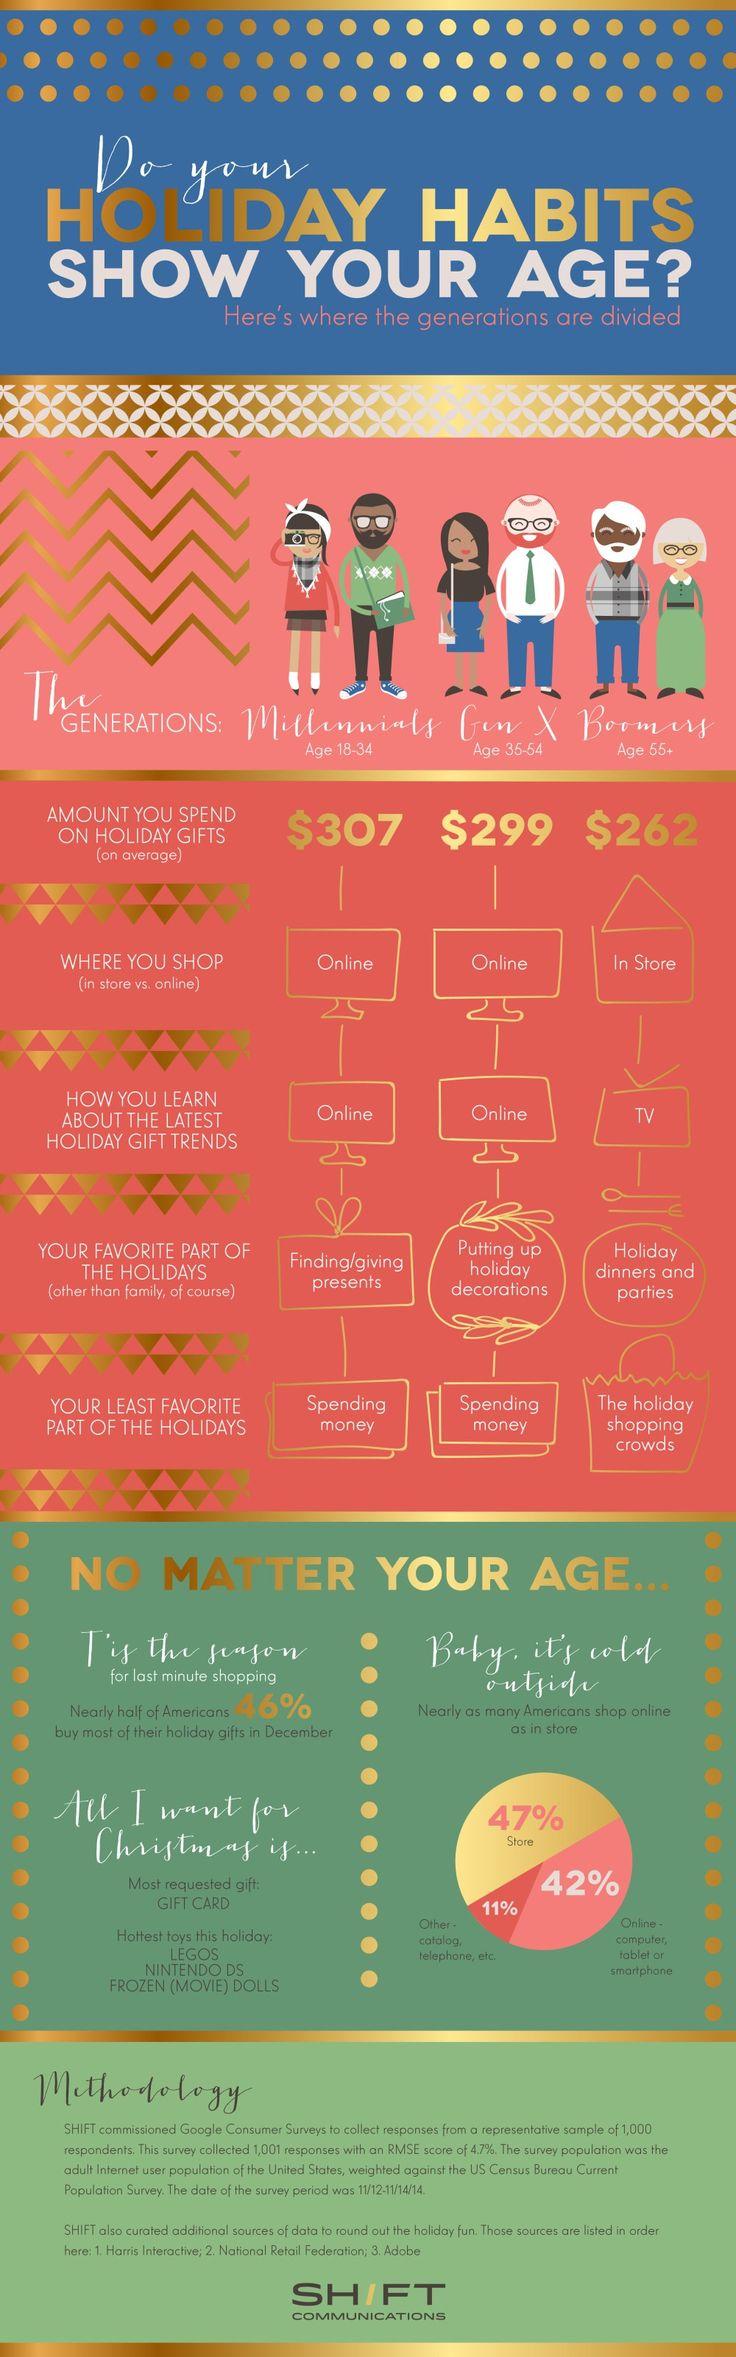 Customer Behavior - Do Your Holiday Habits Show Your Age? [Infographic] -- do your habits fit your age range?